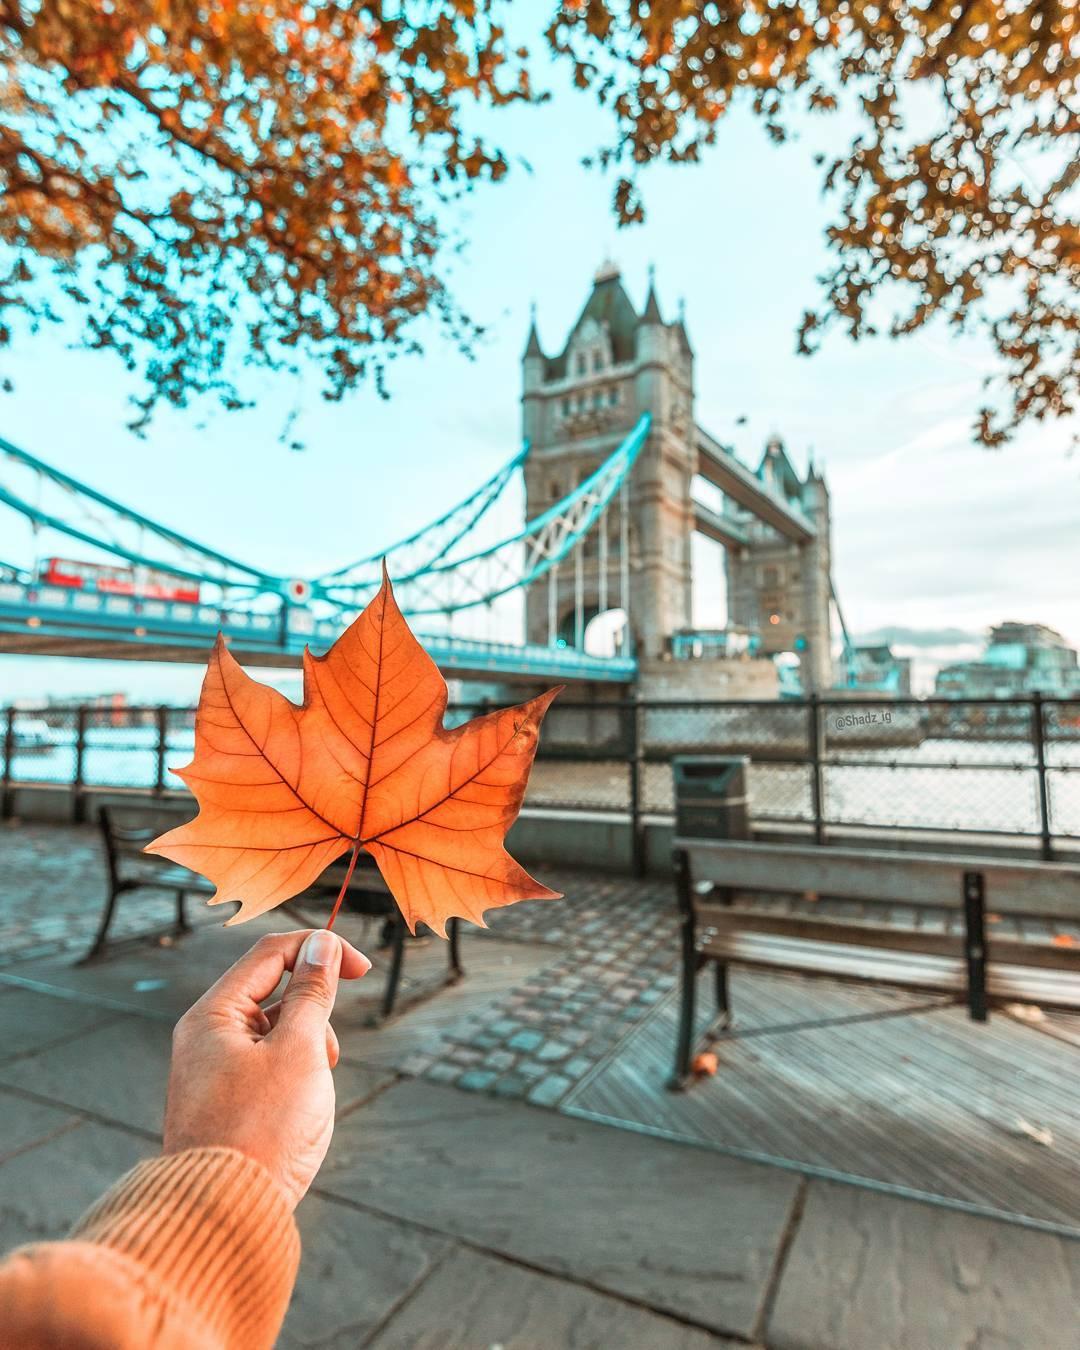 Autumn london tower bridge photo